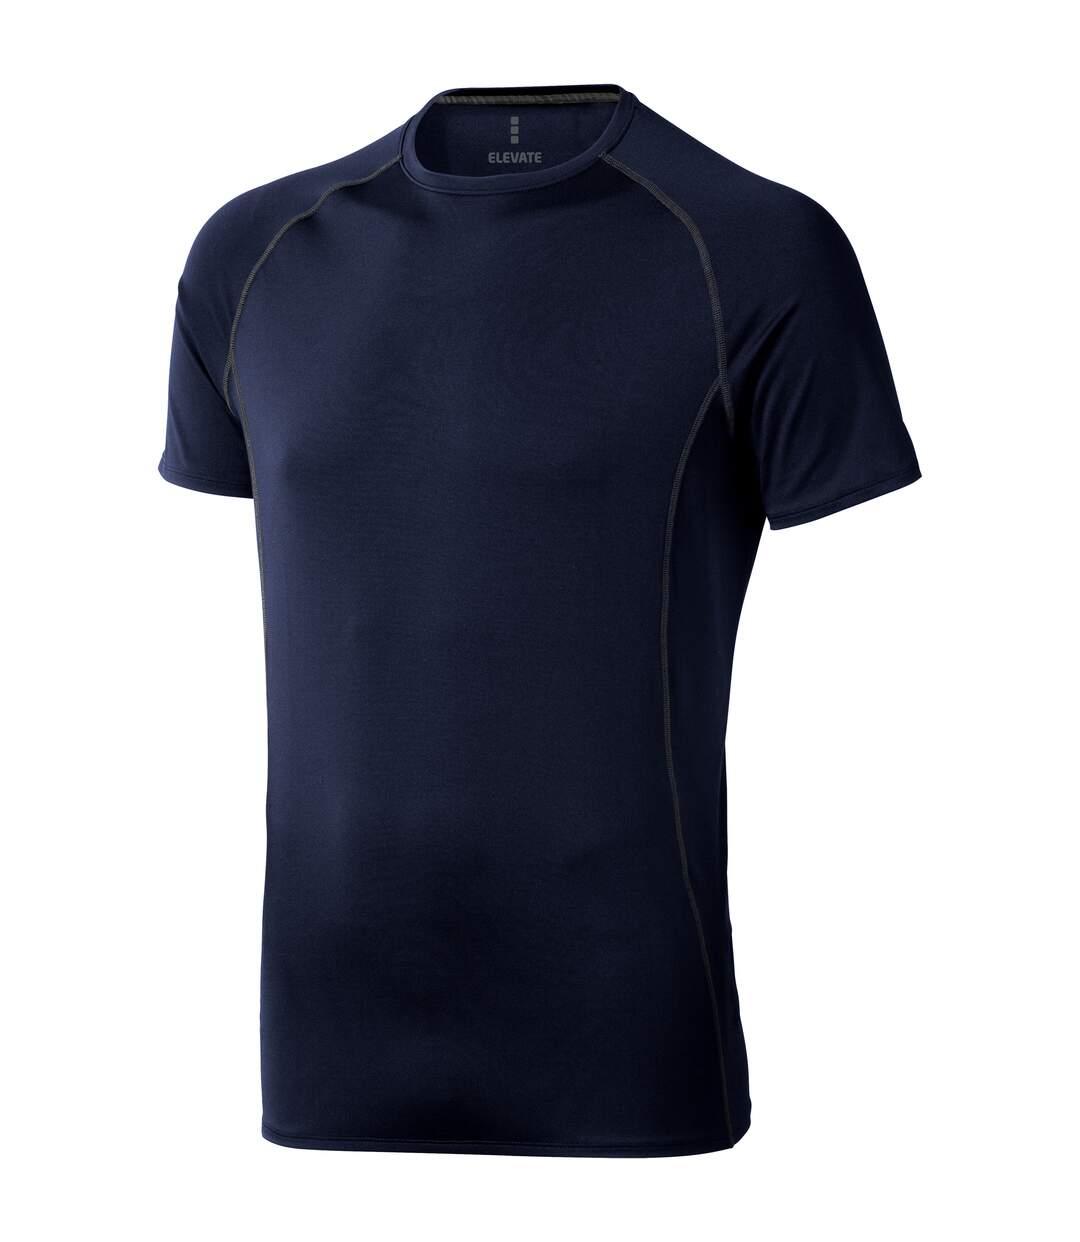 Elevate - T-Shirt Manches Courtes Kingston - Homme (Bleu marine) - UTPF1880